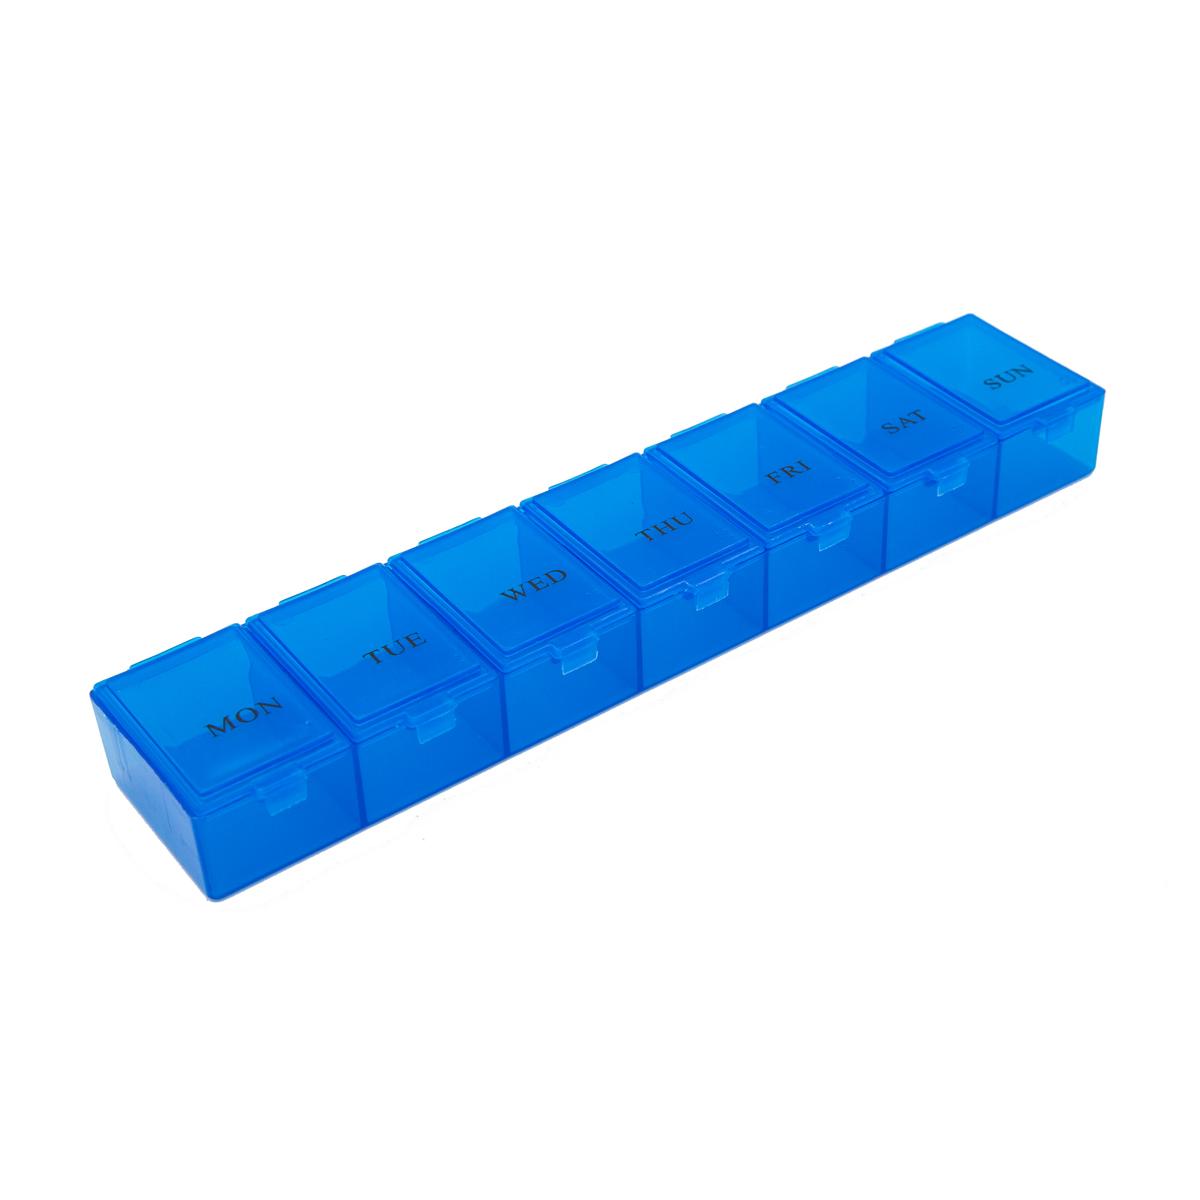 Контейнер для мелочей 930507, 7 секций 23х4,7х3,0 см, Hobby&Pro